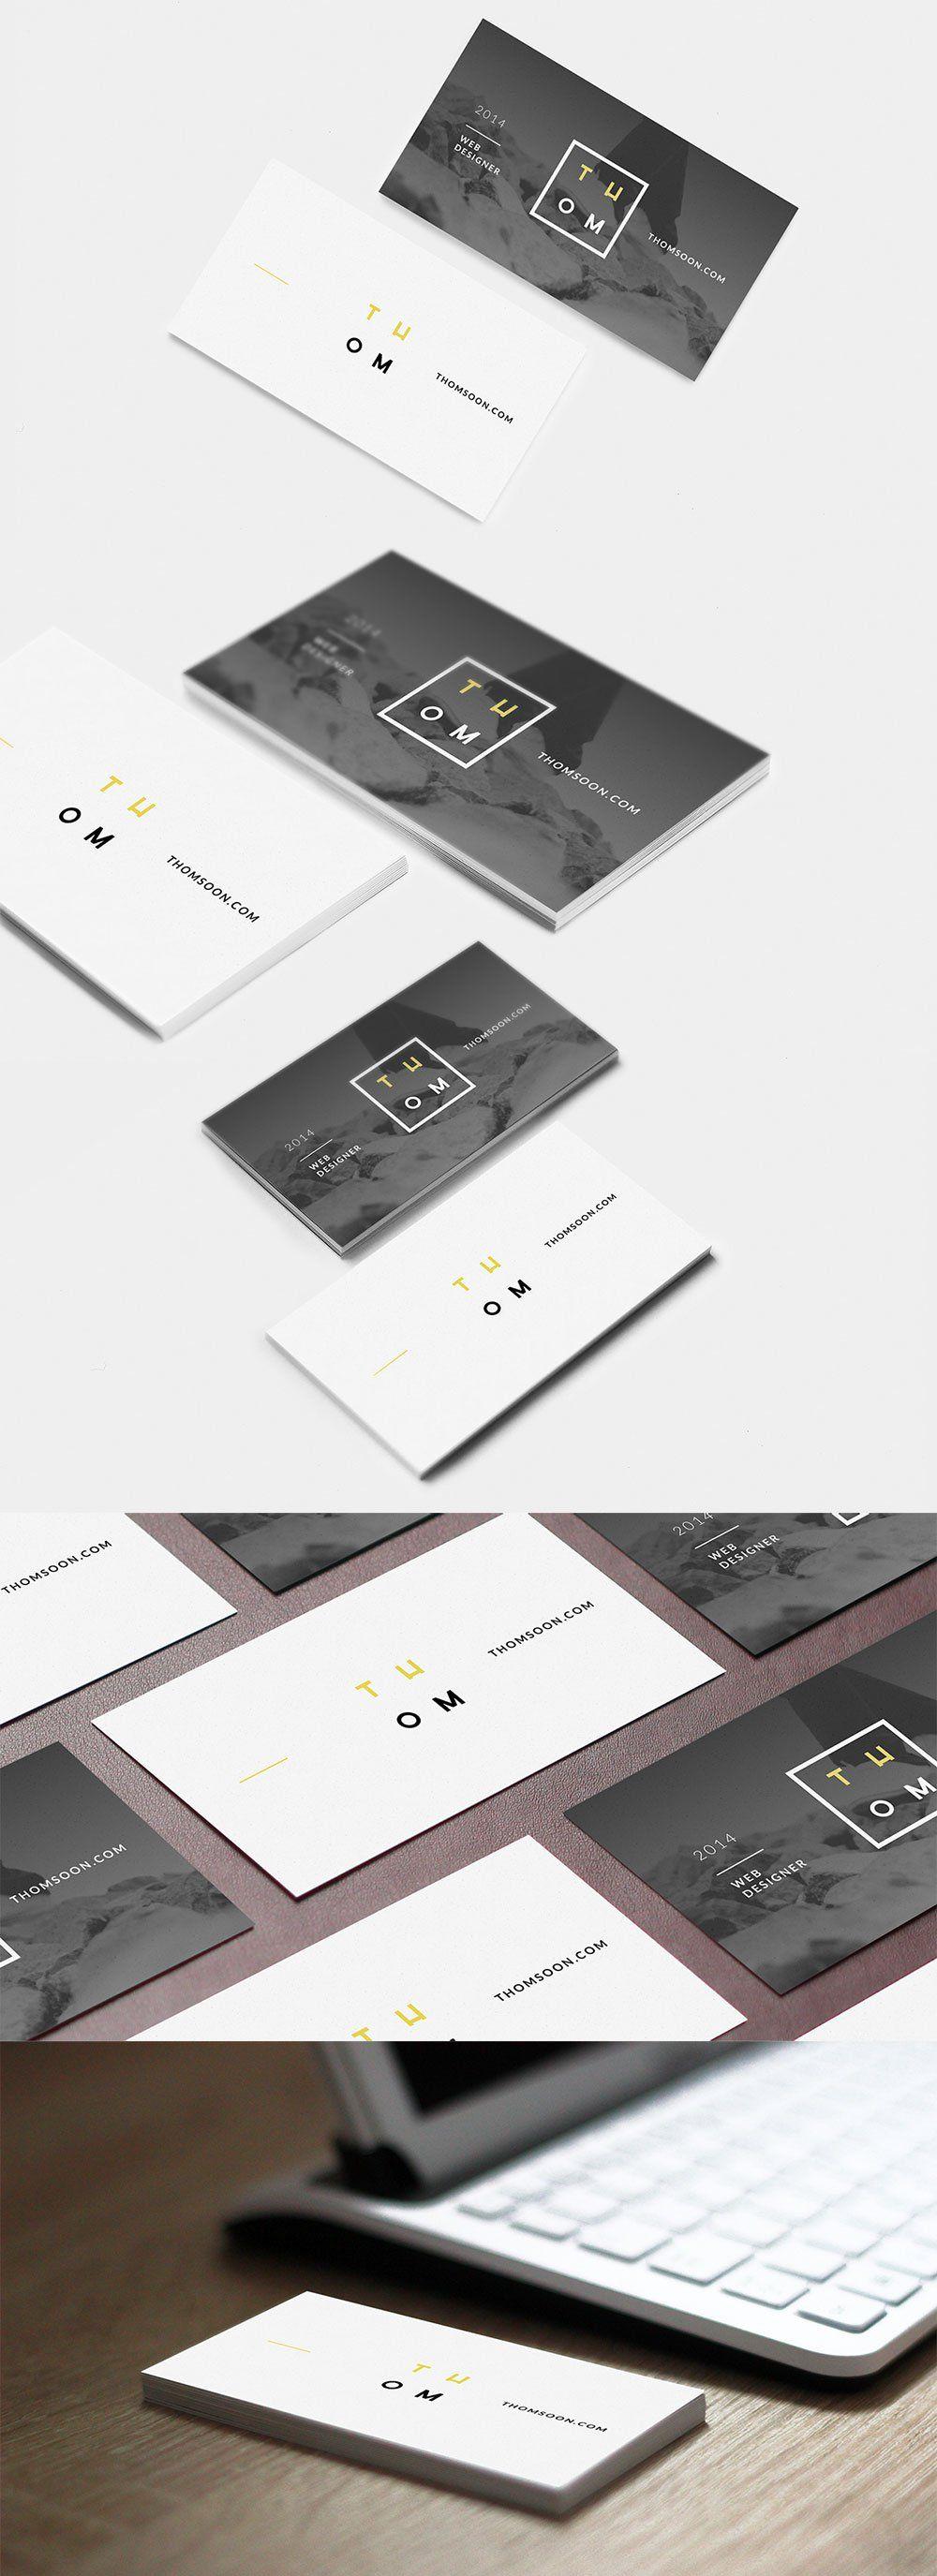 7 free business card mockups inspiration pinterest